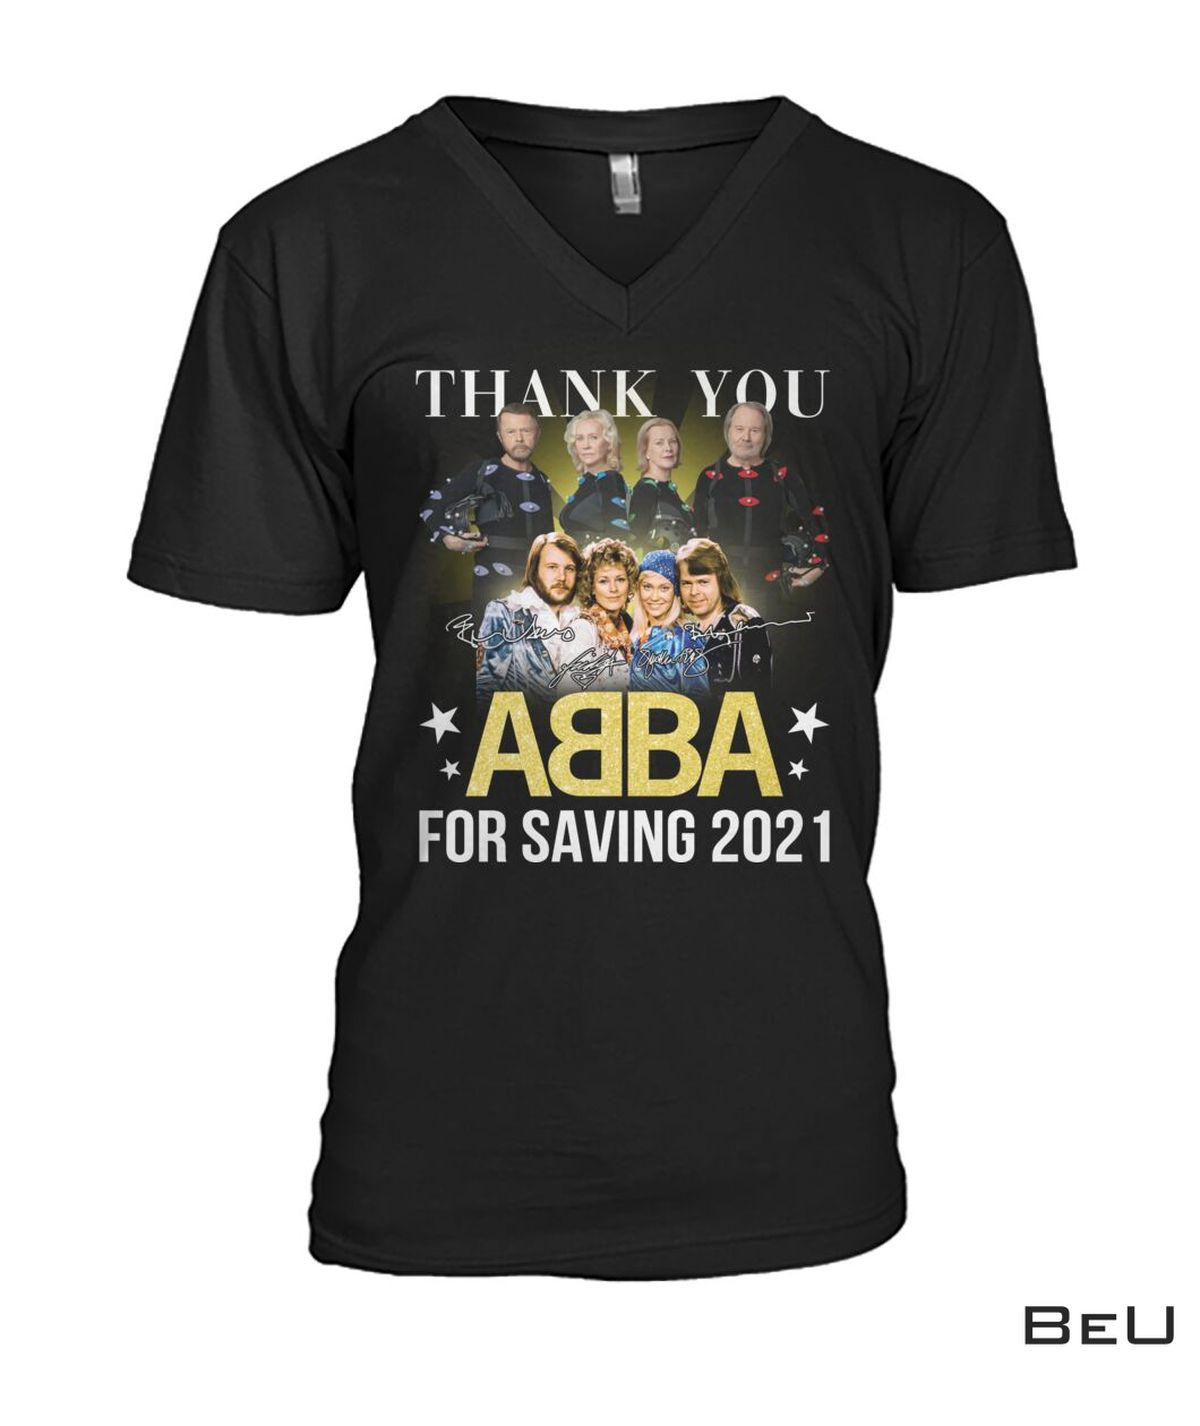 Thank You Abba For Saving 2021 Shirt c